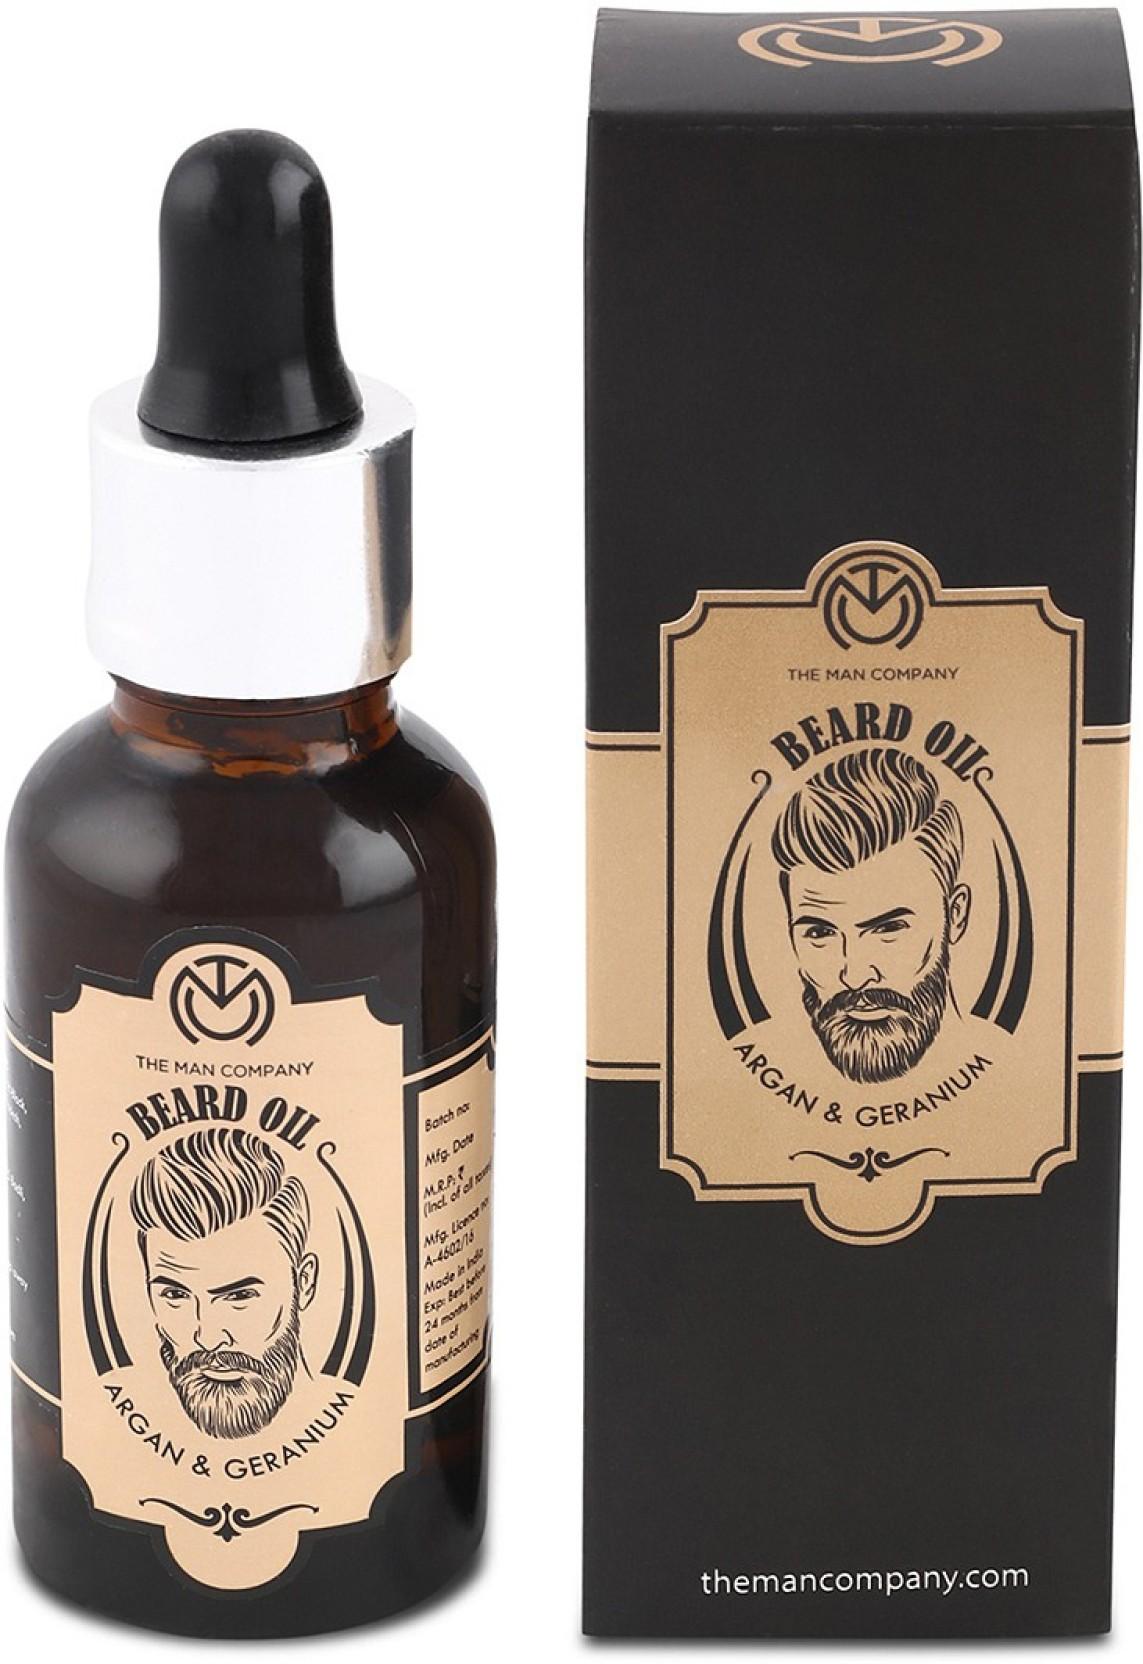 The Man Company Beard Oil Argan Amp Geranium Hair Oil